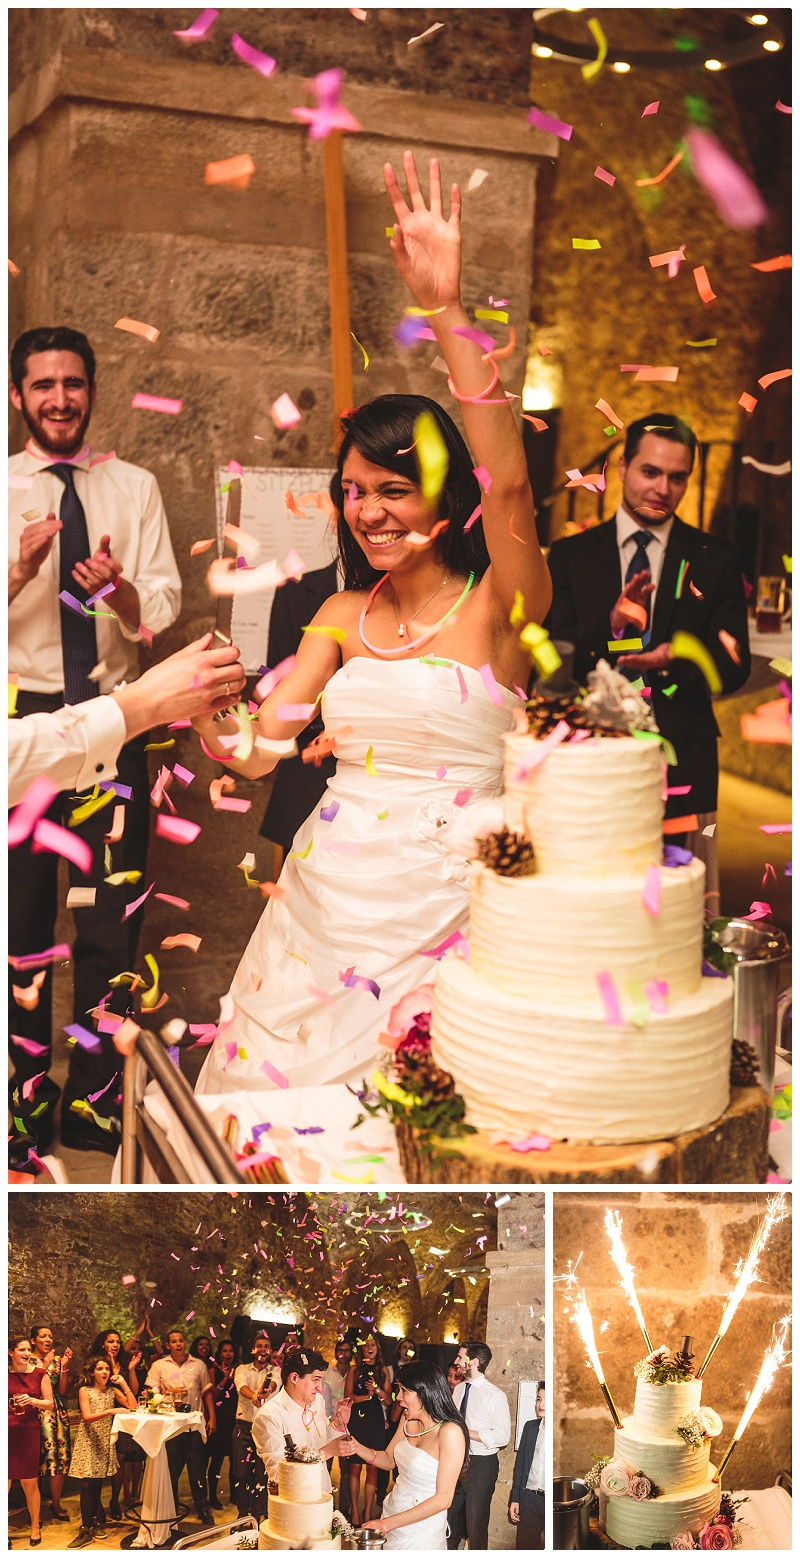 Hochzeit_Klosterneuburg_Tarcila_Stephan_0033